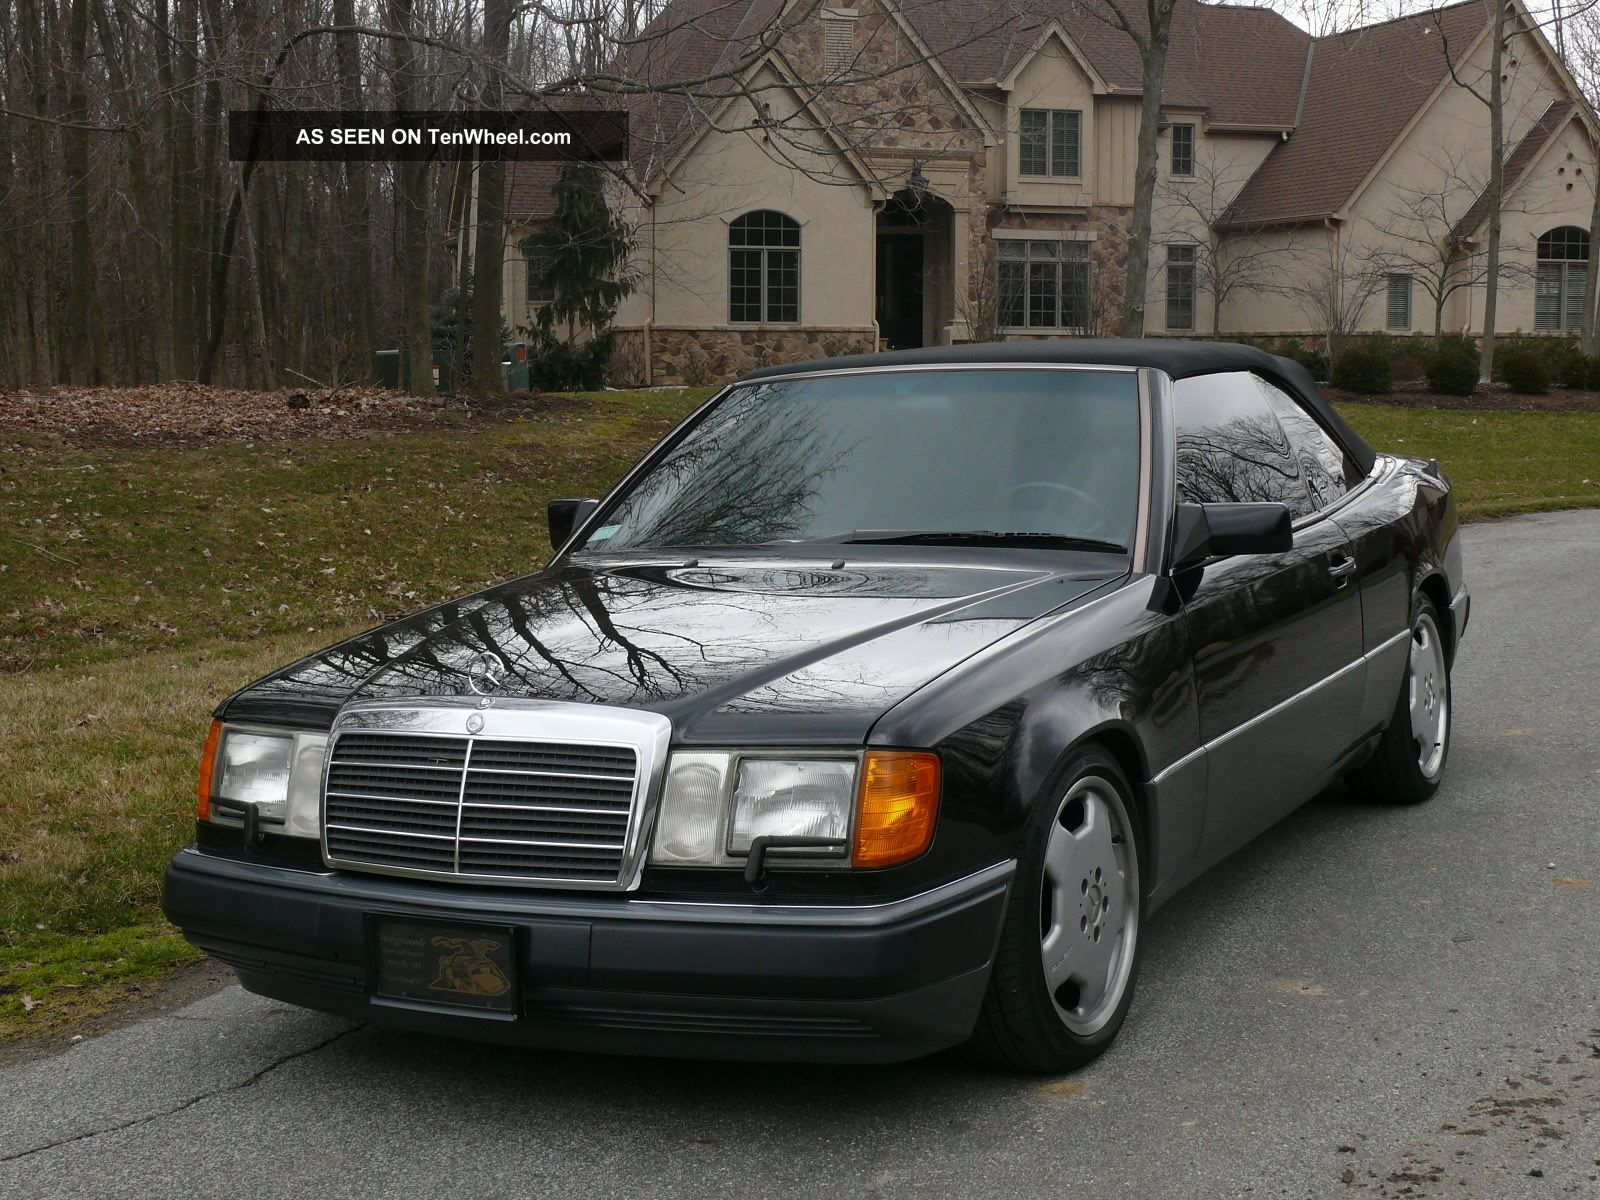 1993 mercedes benz 300ce base convertible 2 door 3 2l for 1993 mercedes benz 300ce